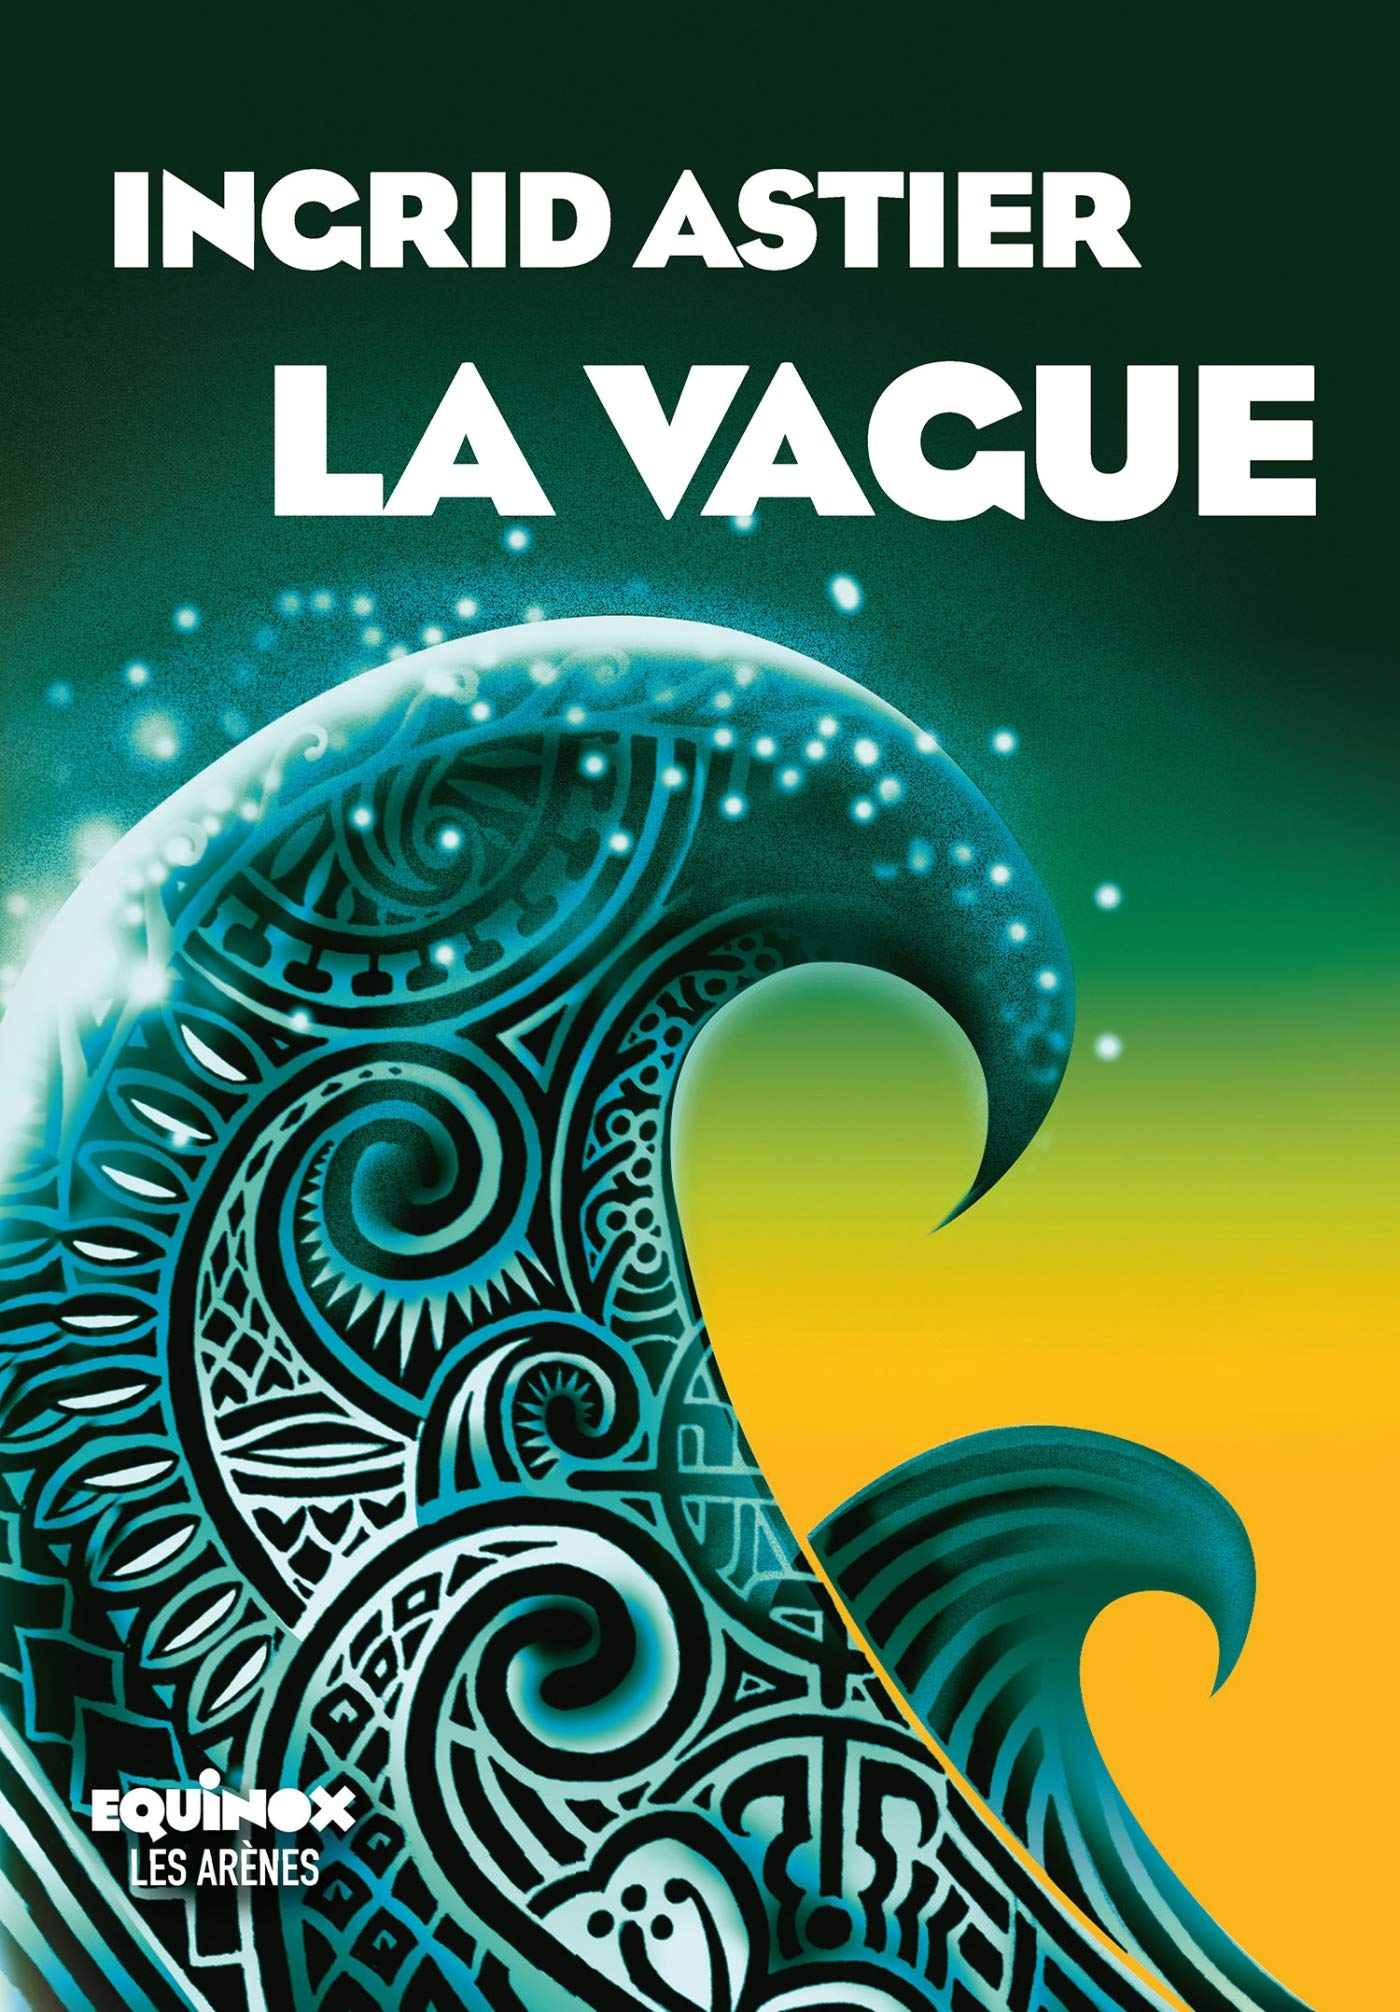 b1ba662c9e Amazon.fr - La Vague - Ingrid Astier - Livres